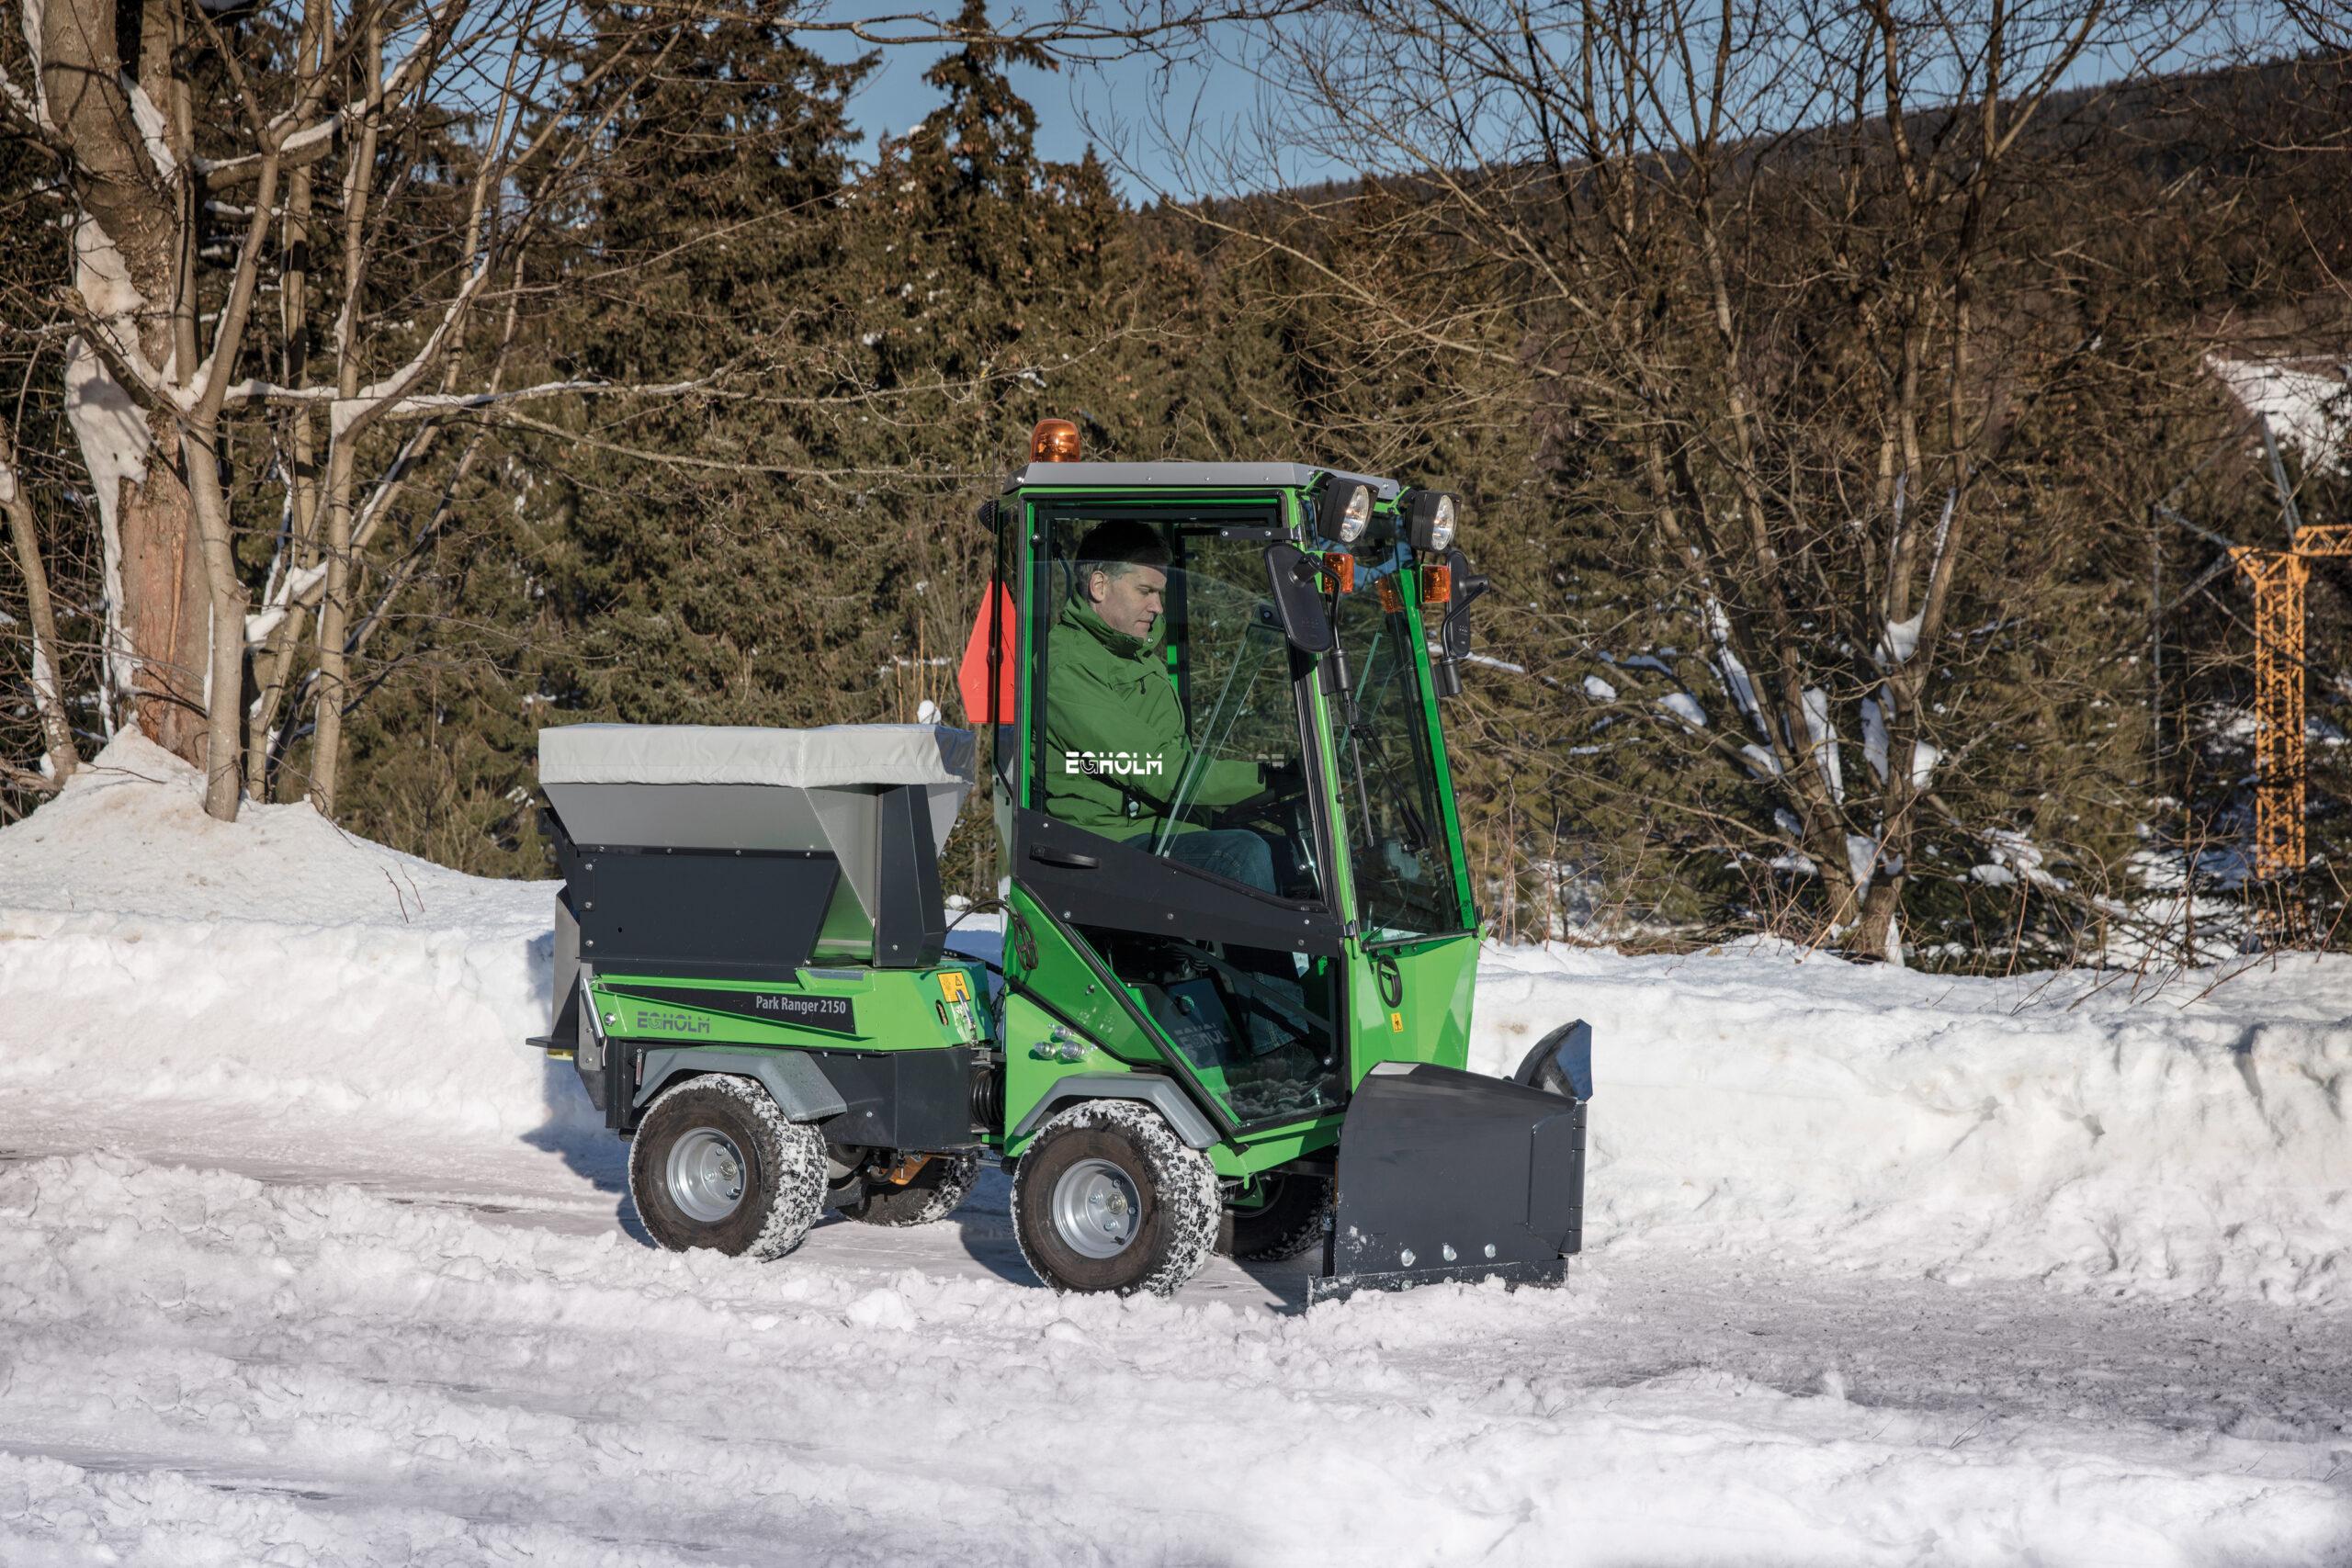 Egholm Park Ranger 2150 Winteraktion